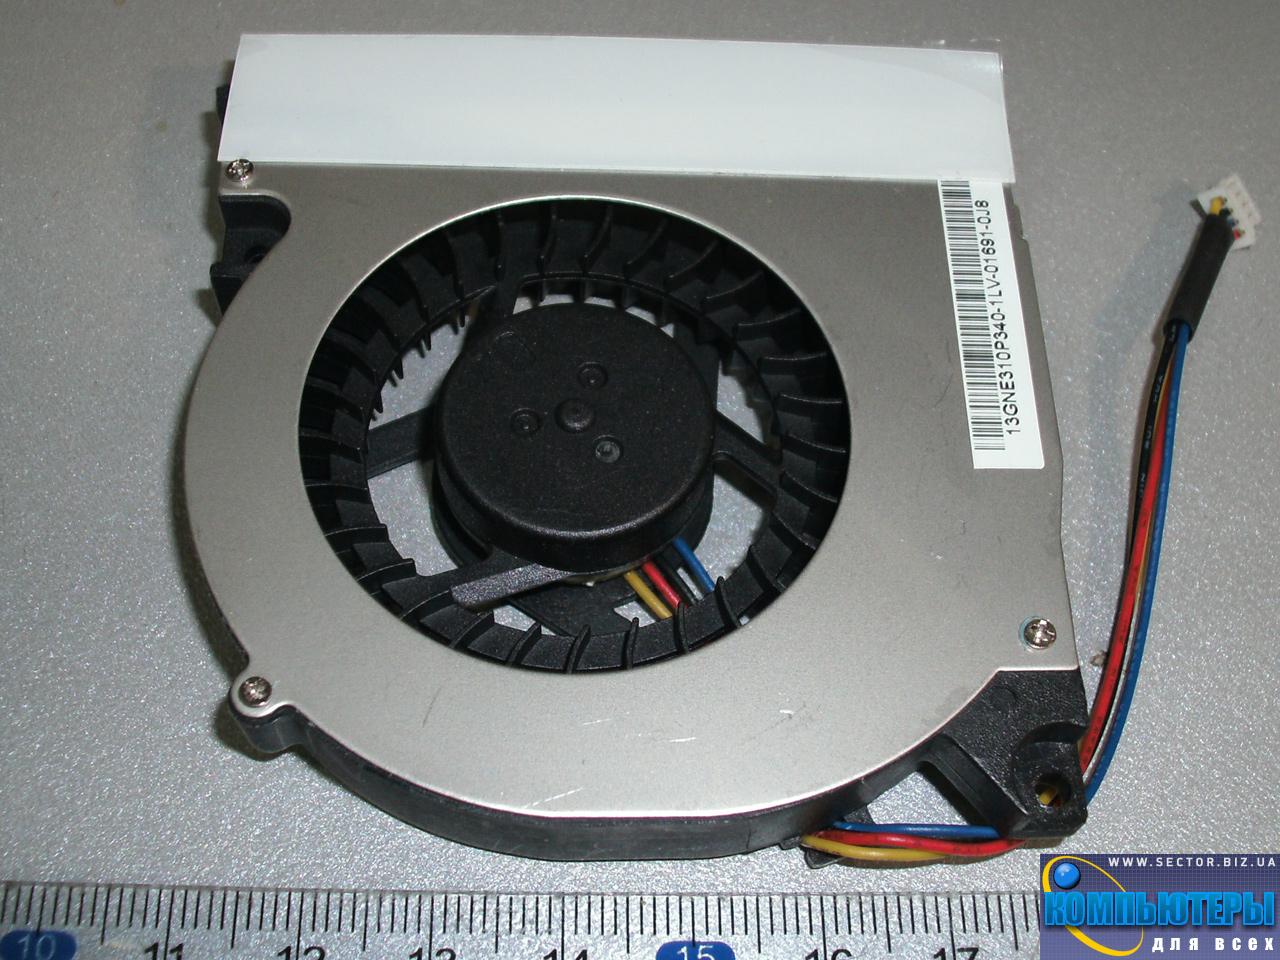 Кулер к ноутбуку Lenovo Y510 Y520 Y530 F51 p/n: KDB0705HB. Фото № 3.